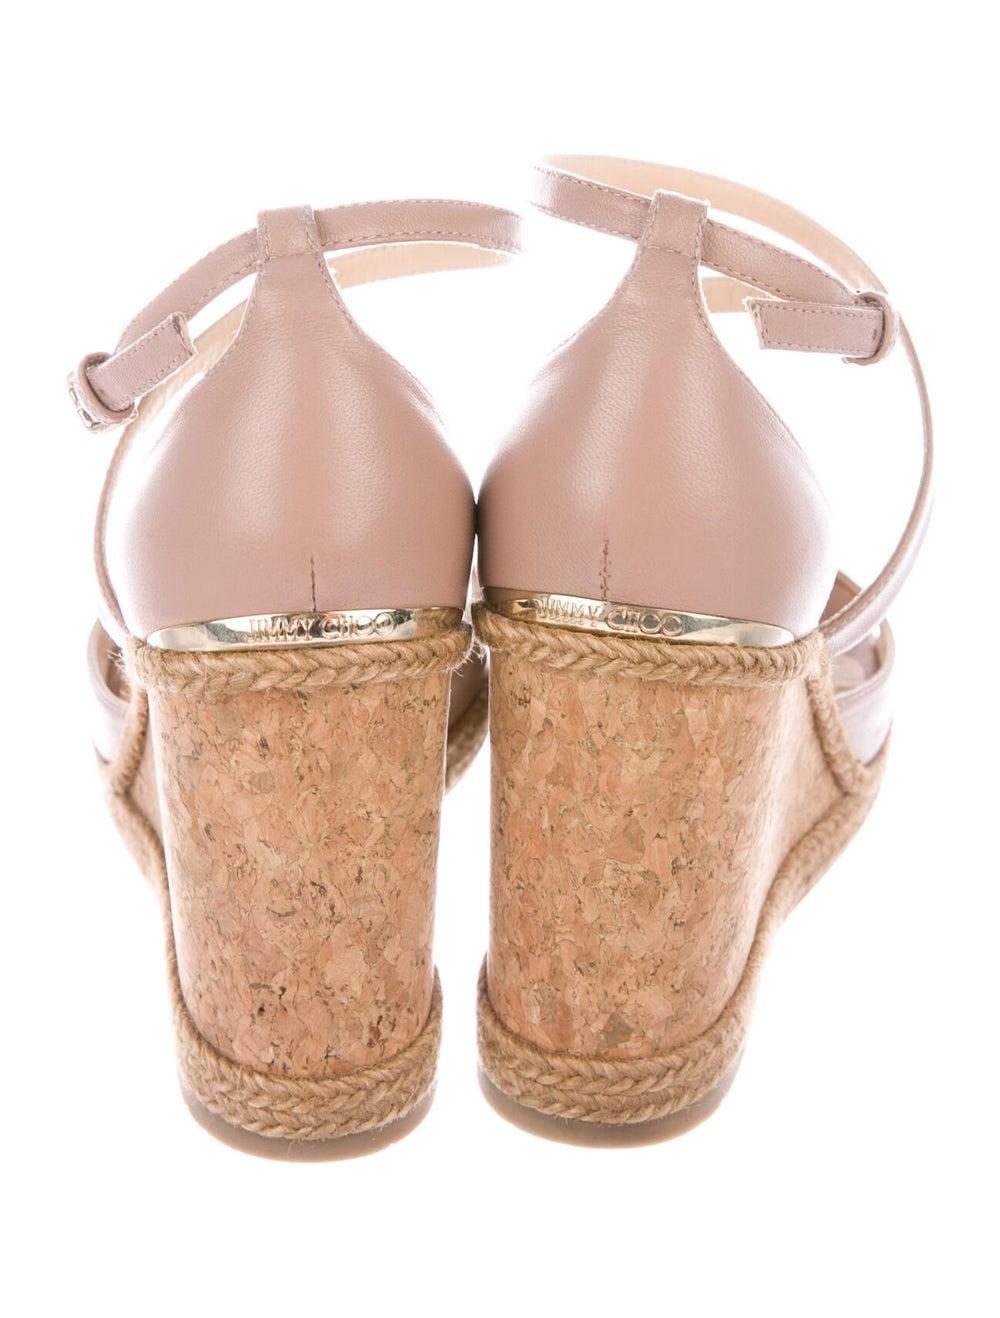 Jimmy Choo Leather Espadrilles Pink - image 4